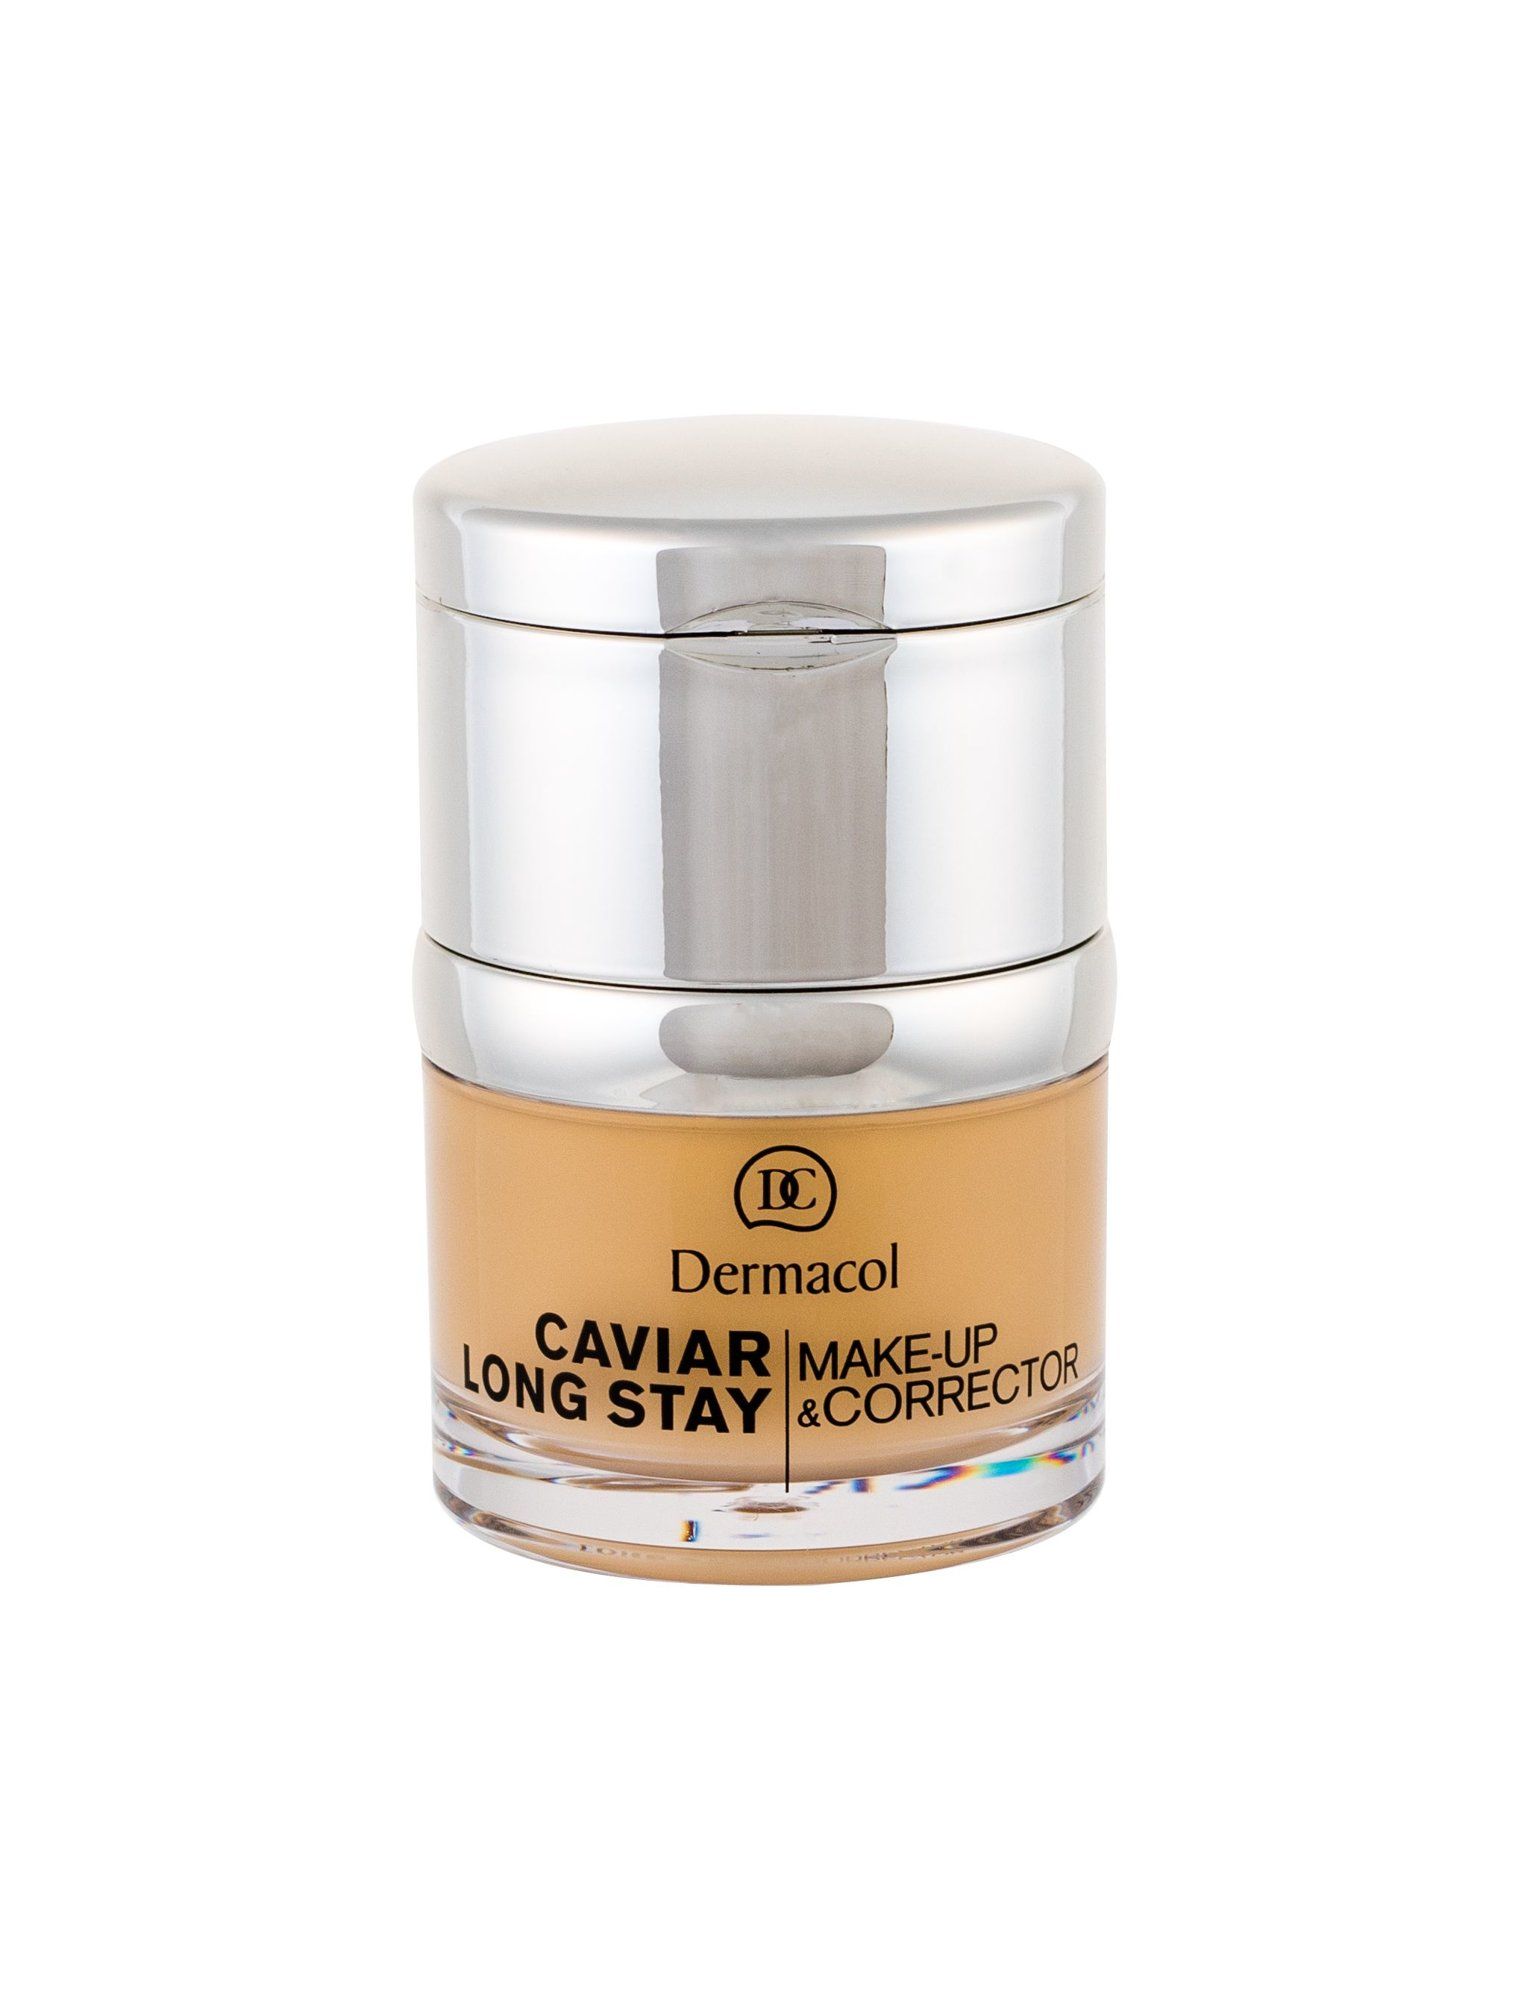 Dermacol Caviar Long Stay Makeup 30ml 1,5 Sand